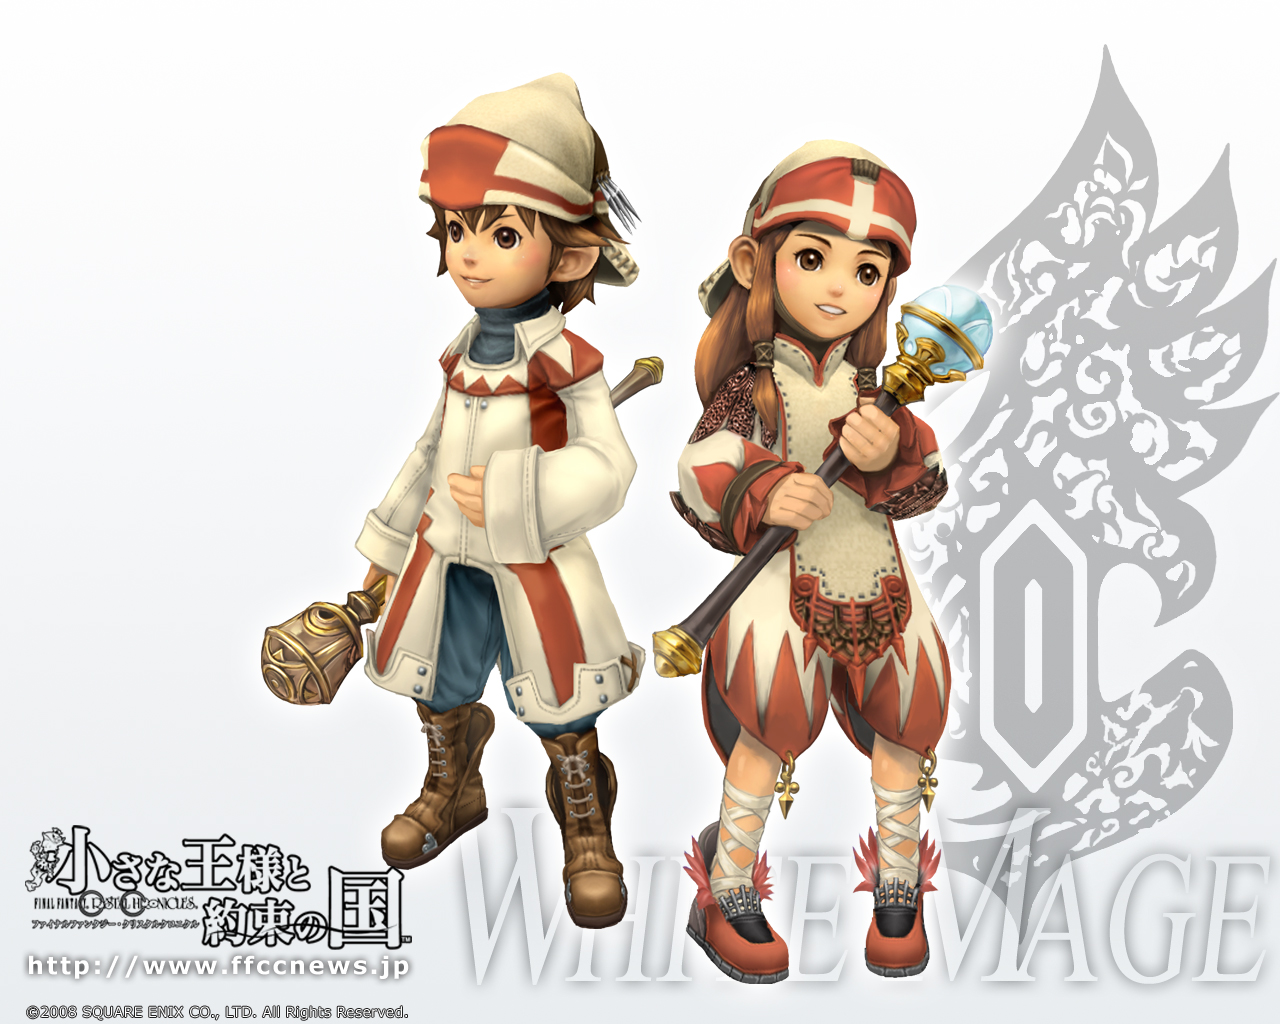 Image Final Fantasy Final Fantasy Crystal Chronicles Games